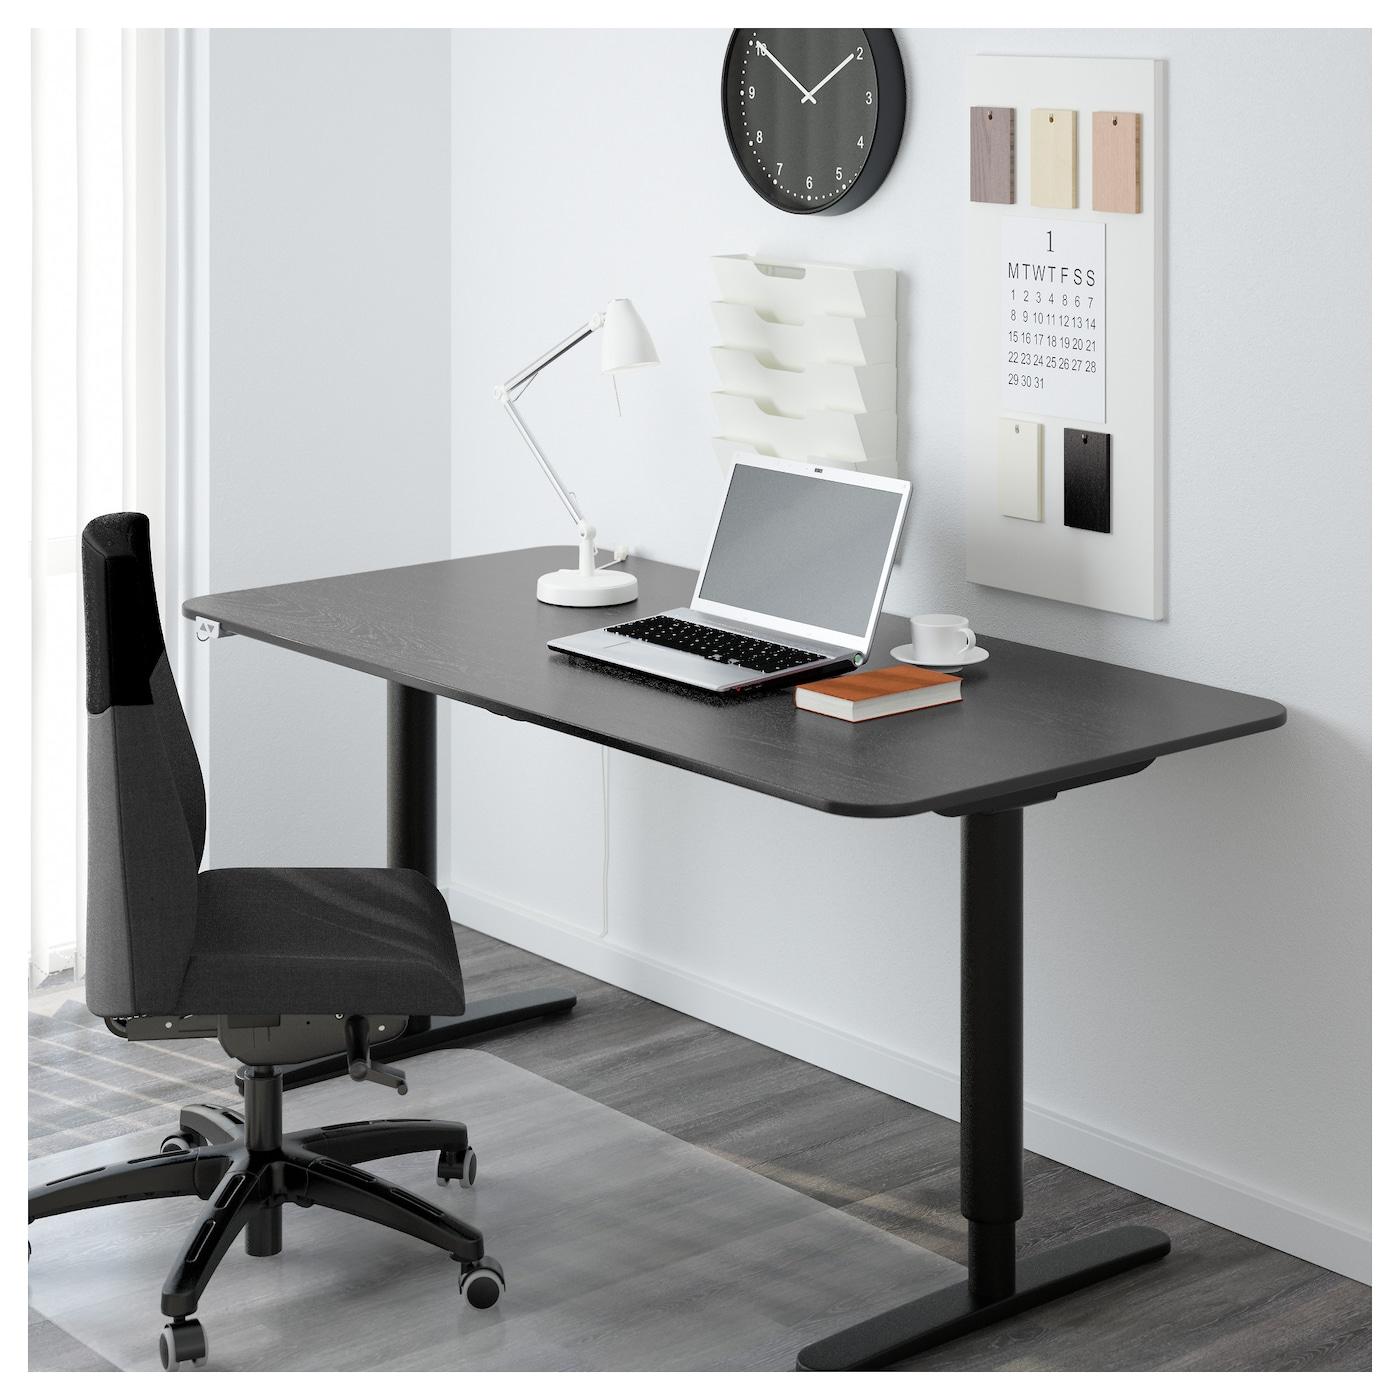 Ikea Office Desk 68 Most Unbeatable Ikea Desk Chair Double Computer